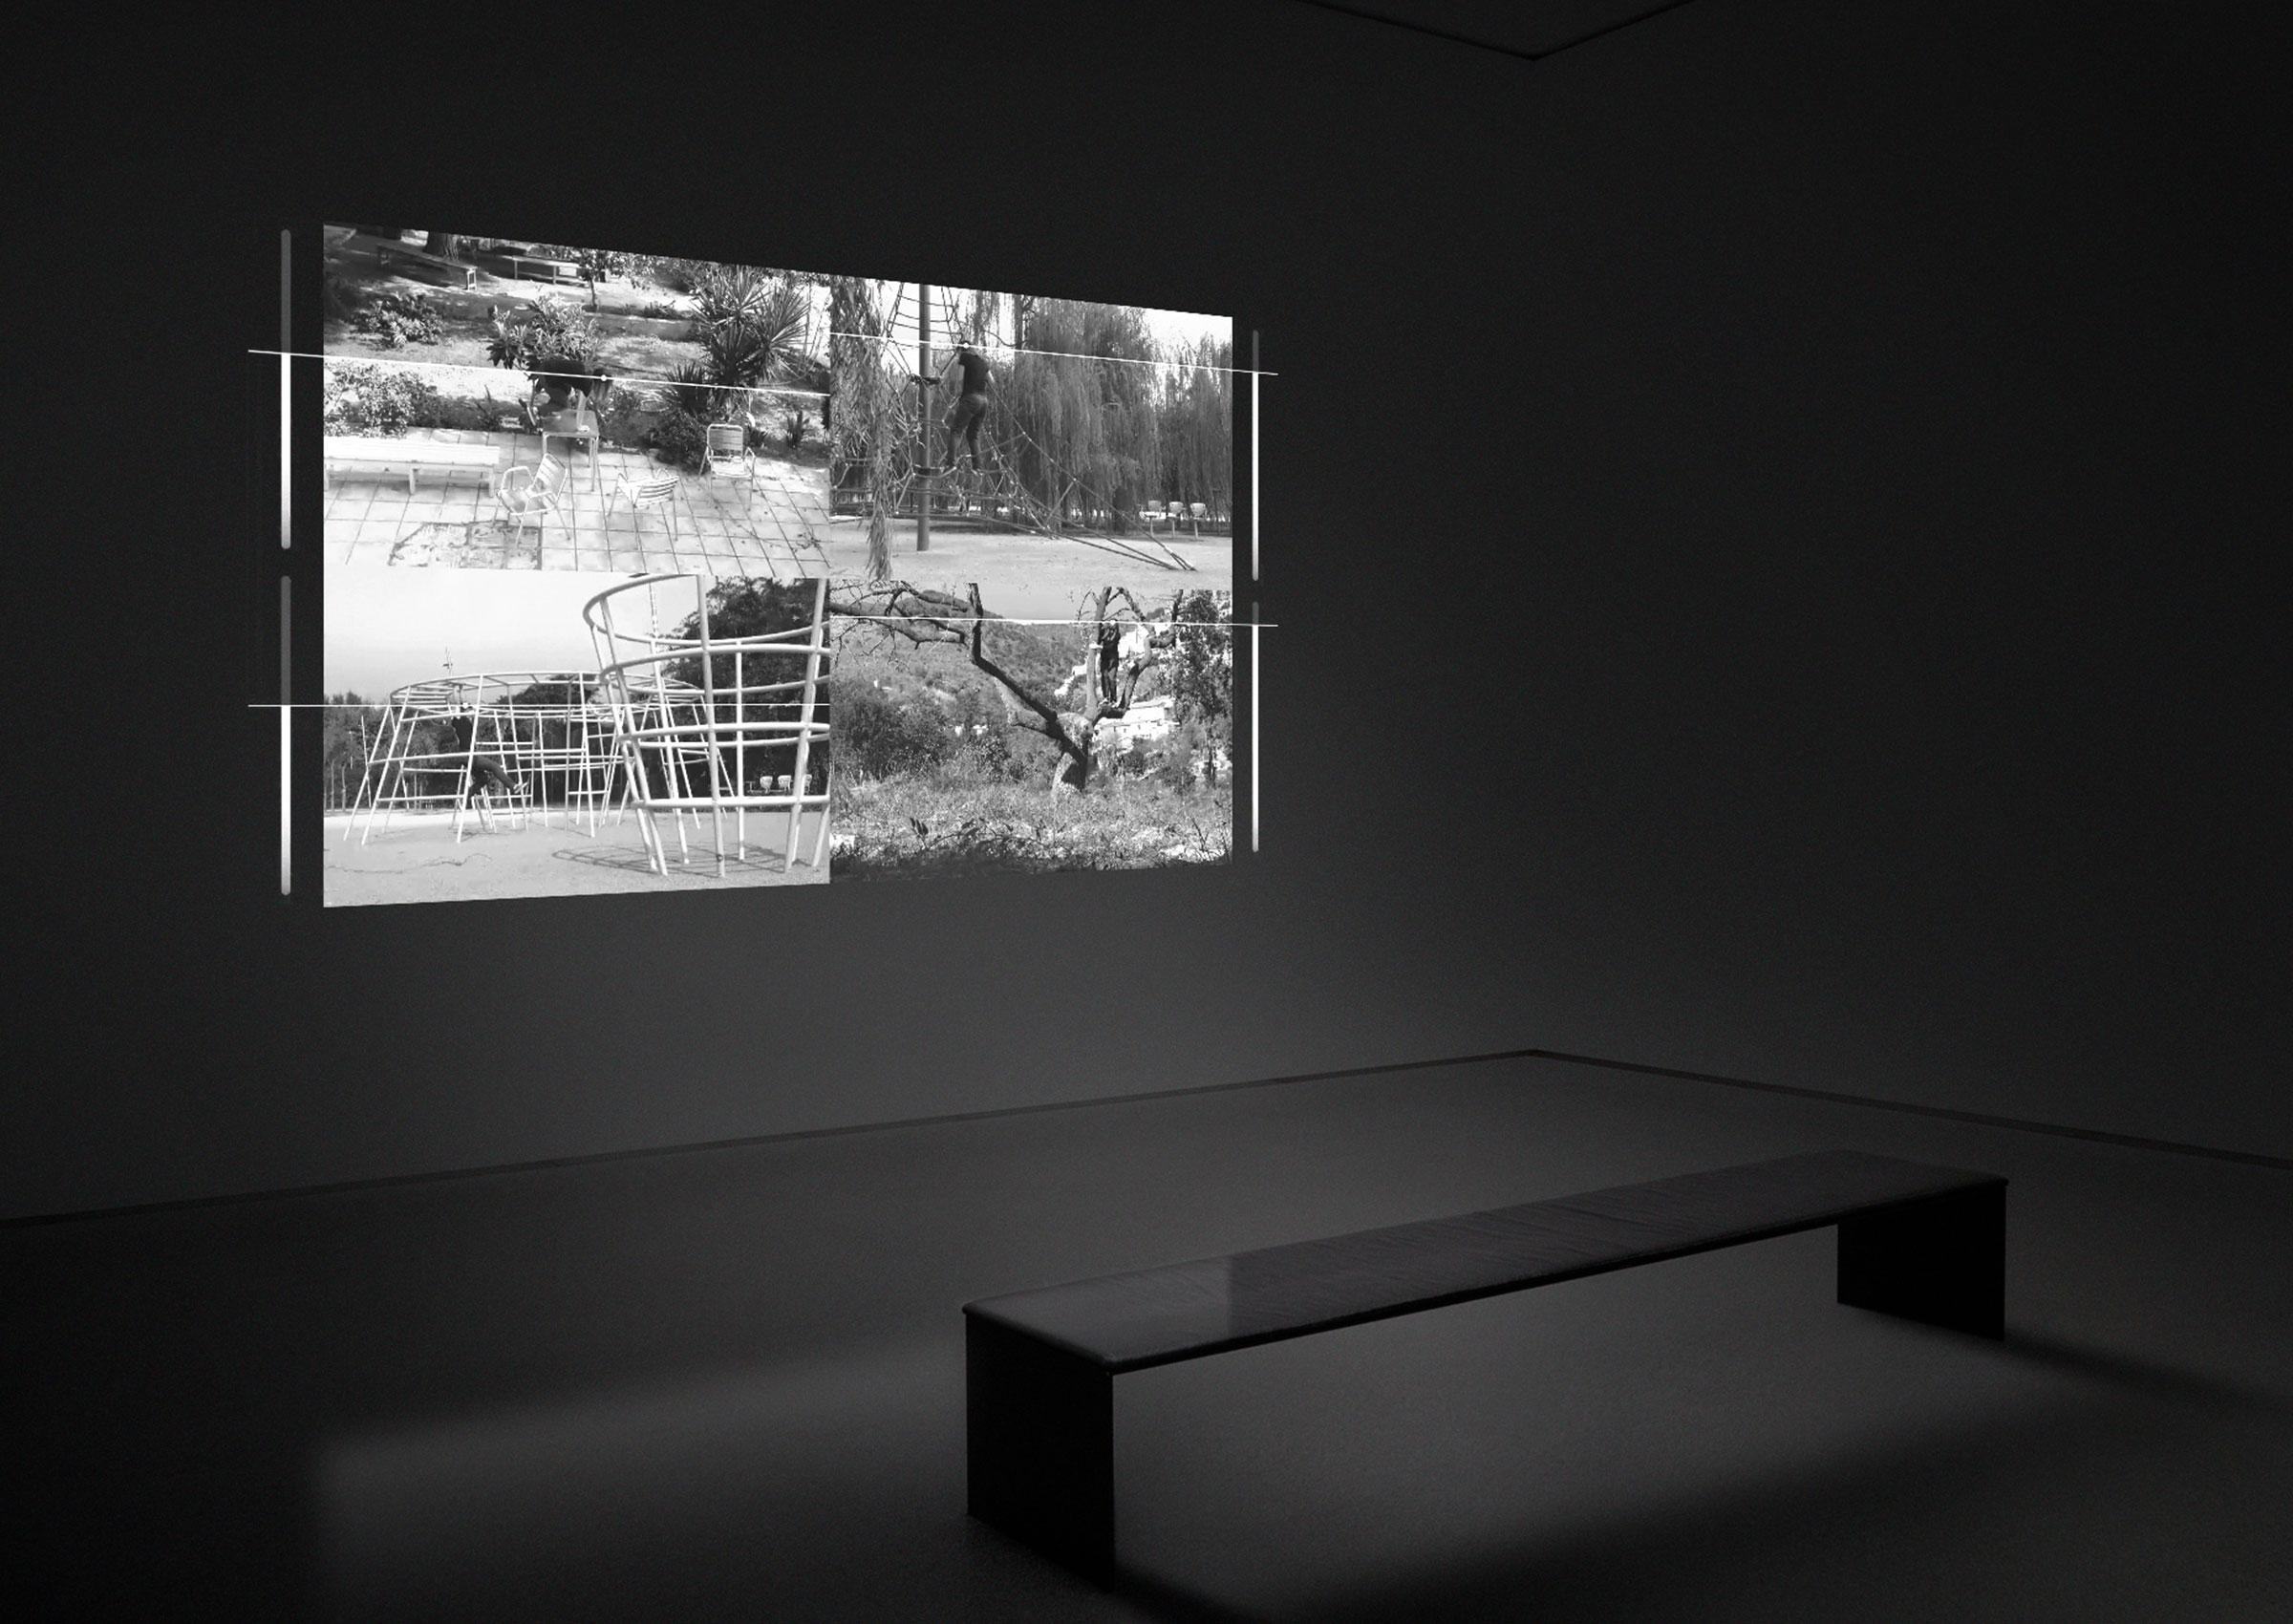 Jacek Doroszenko - The same horizon repeated at every moment of the walk - exhibition 1